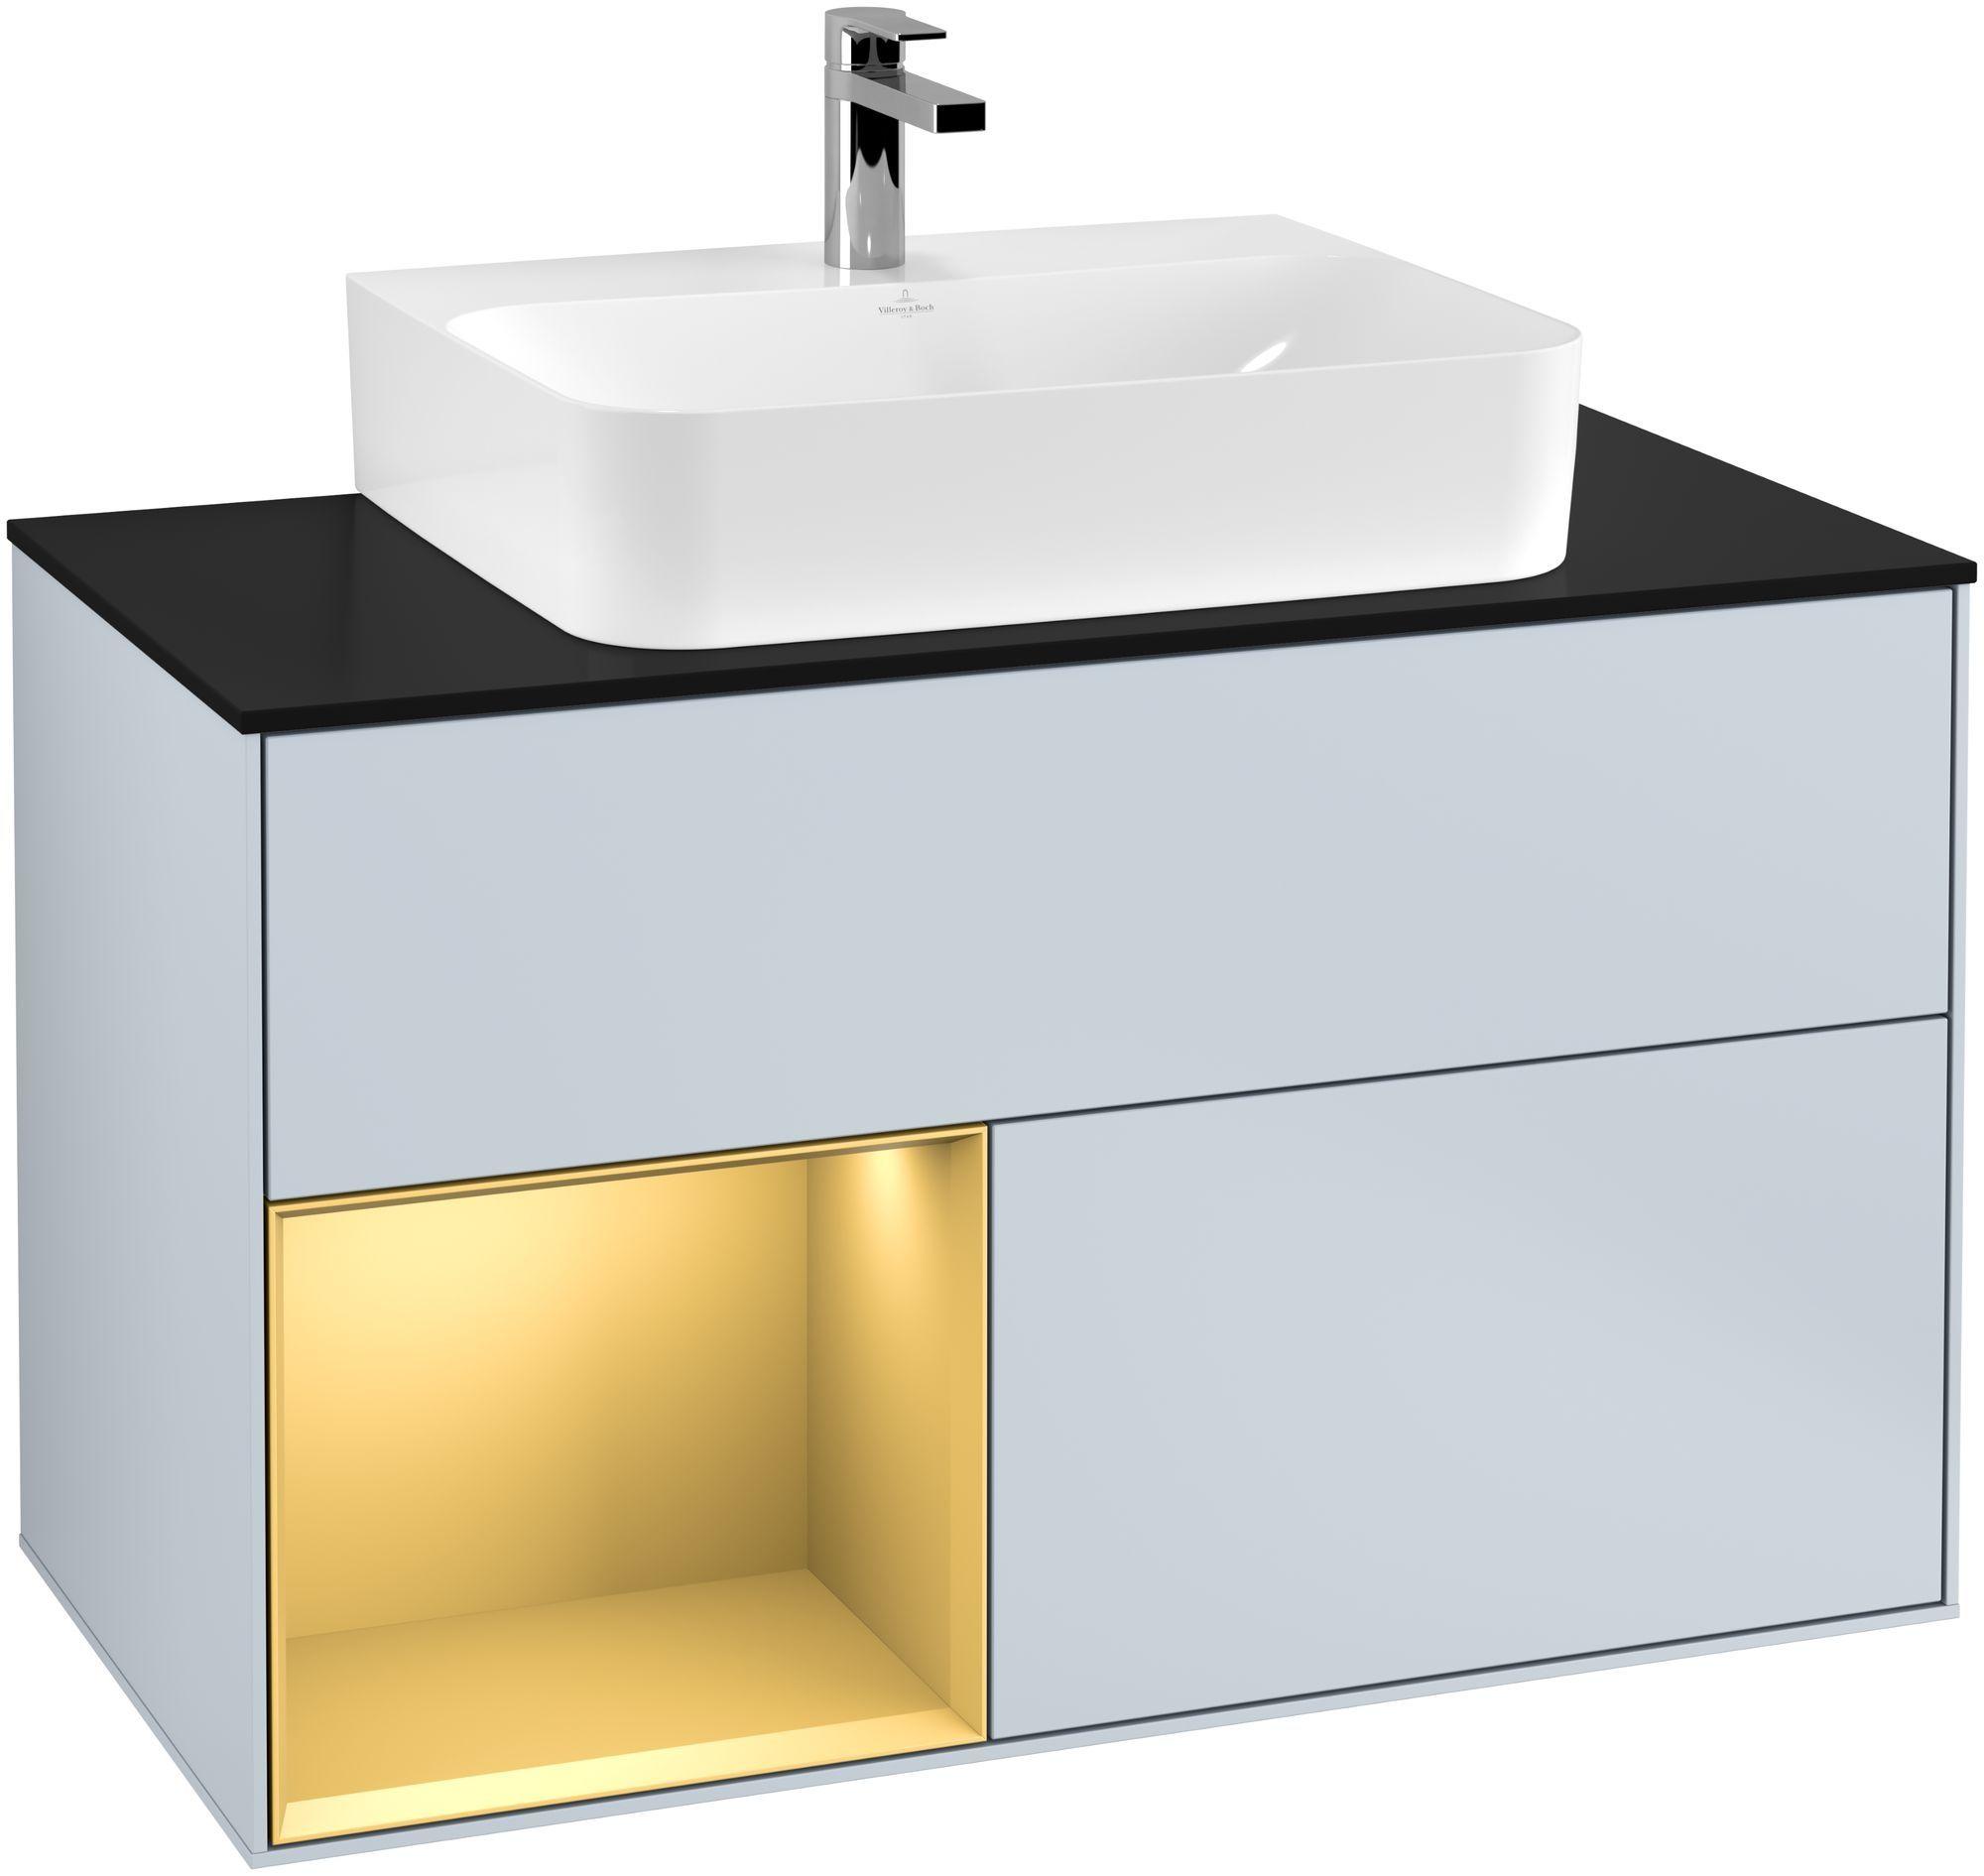 Villeroy & Boch Finion G11 Waschtischunterschrank mit Regalelement 2 Auszüge für WT mittig LED-Beleuchtung B:100xH:60,3xT:50,1cm Front, Korpus: Cloud, Regal: Gold Matt, Glasplatte: Black Matt G112HFHA